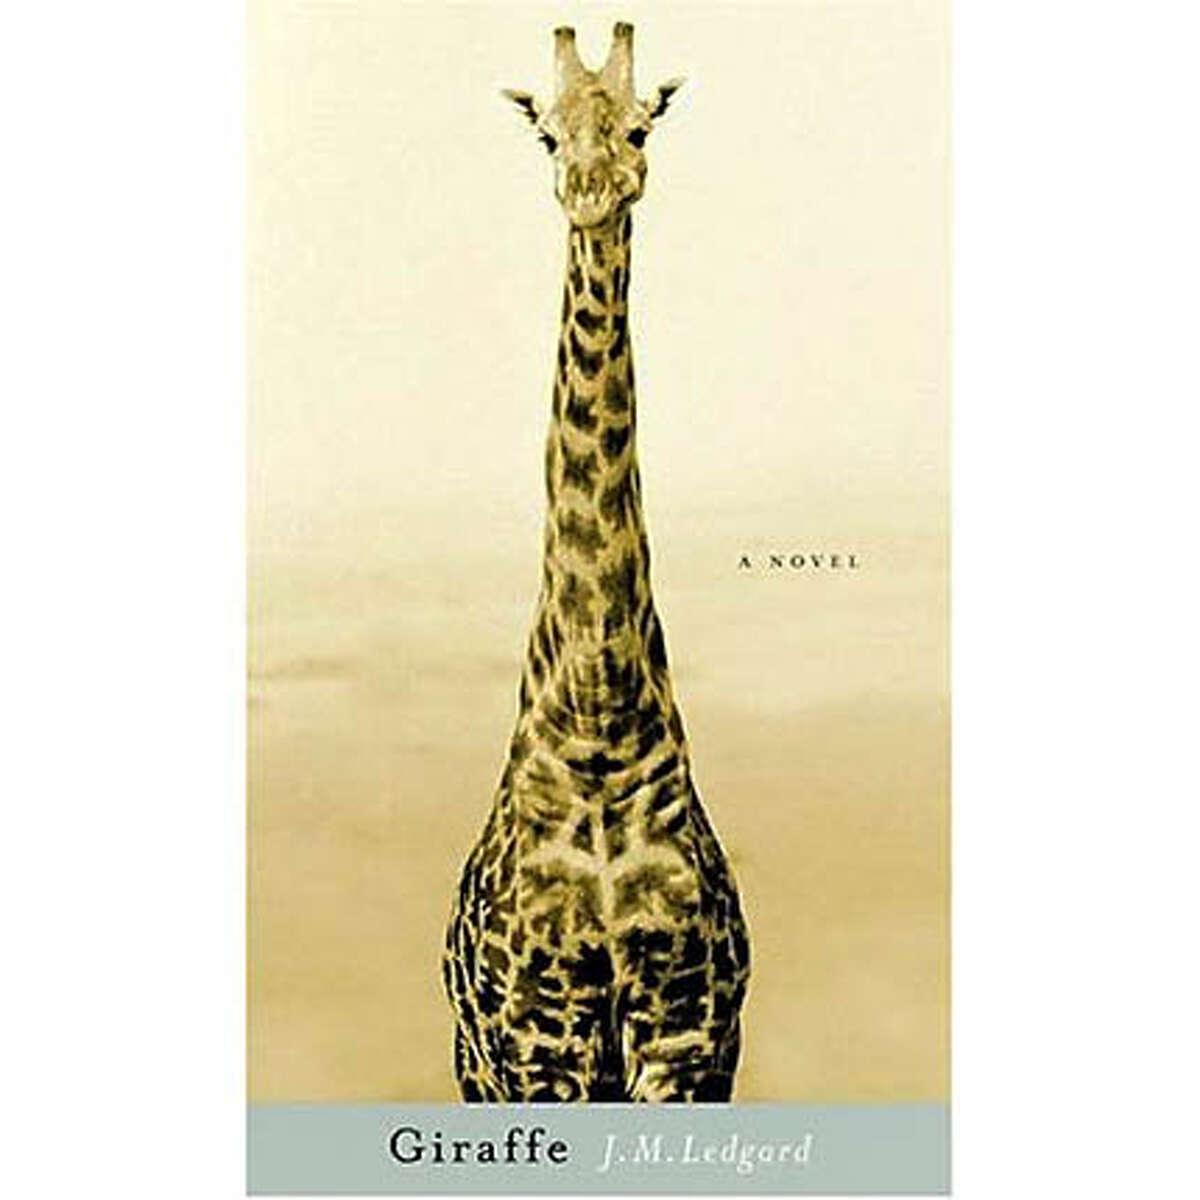 """Giraffe"" by J.M. Ledgard"